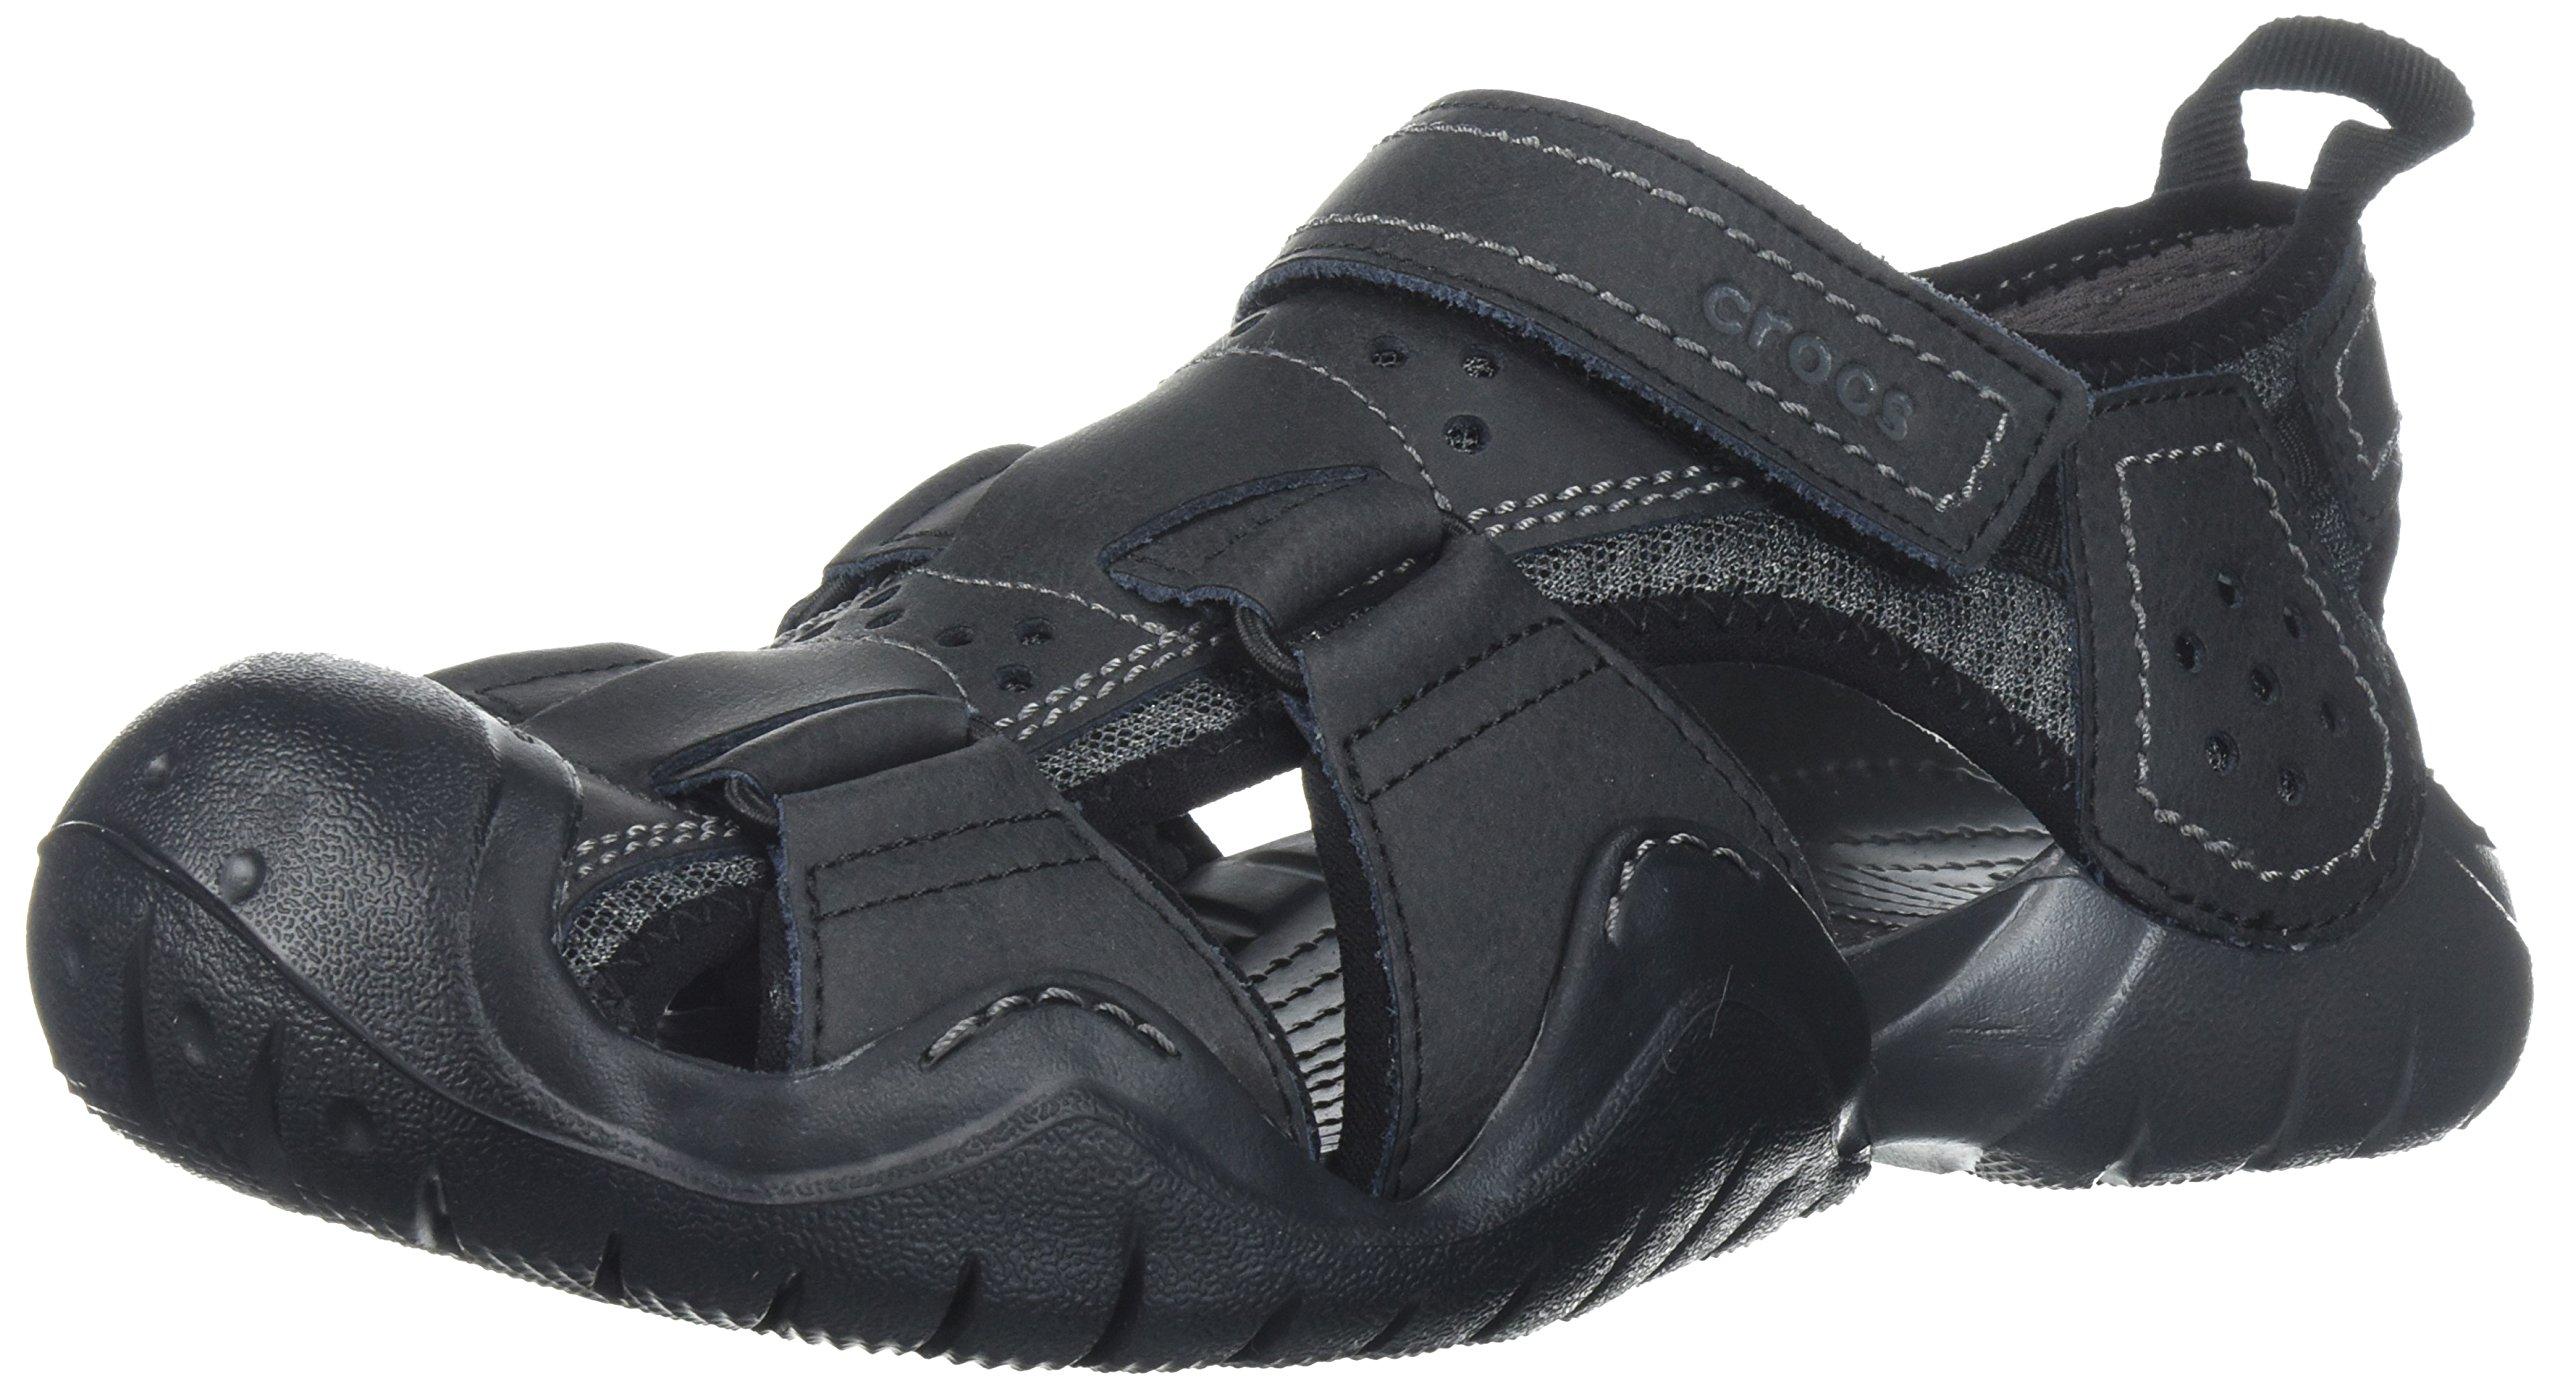 Crocs Men's Swiftwater Leather Fisherman M Flat Sandal, Black/Graphite, 9 M US